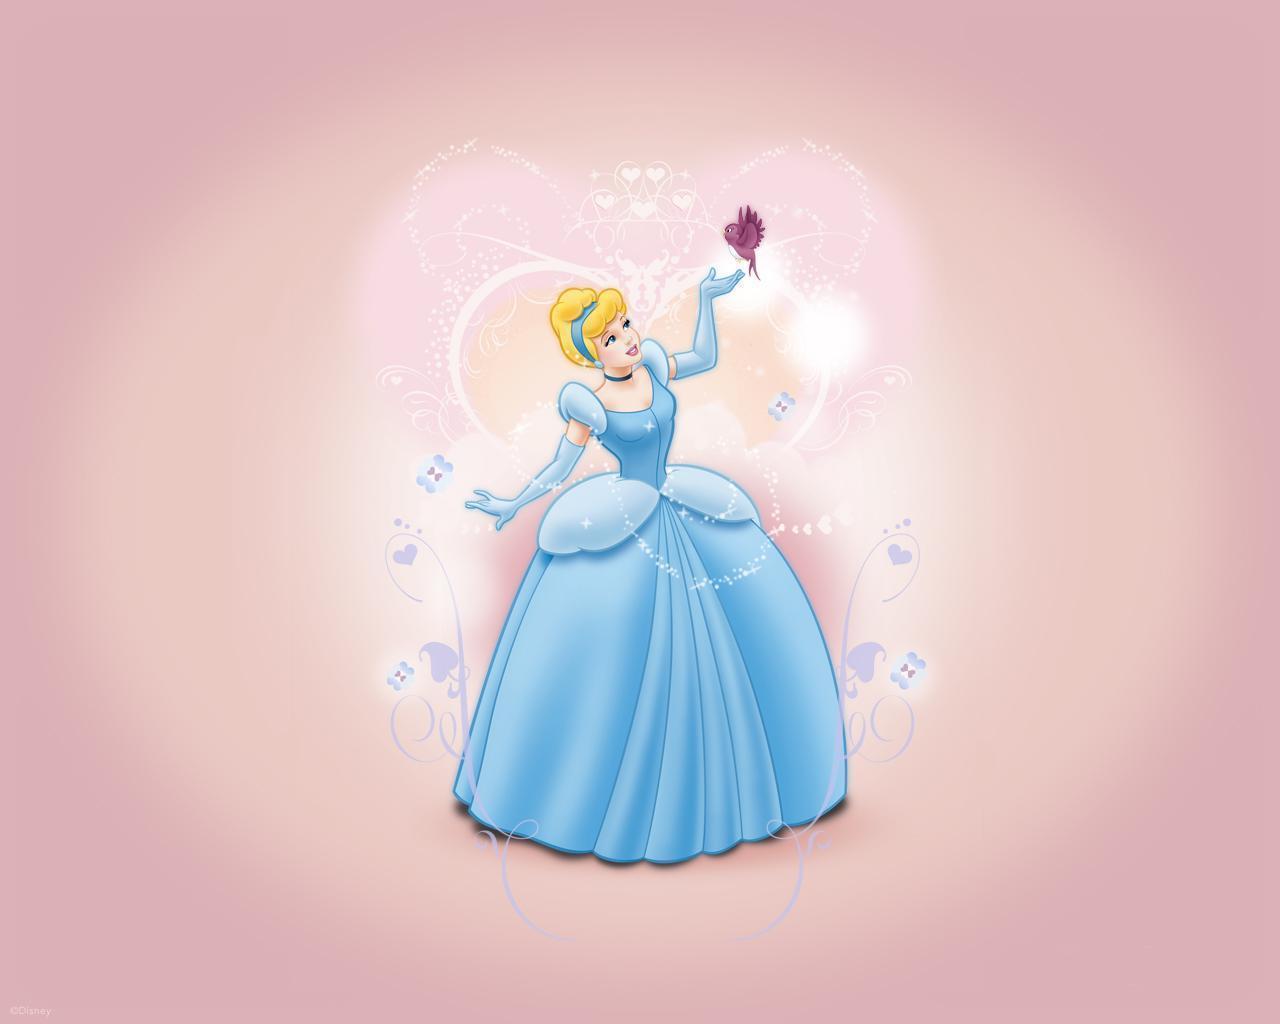 Cinderella images Cinderella HD wallpaper and background photos